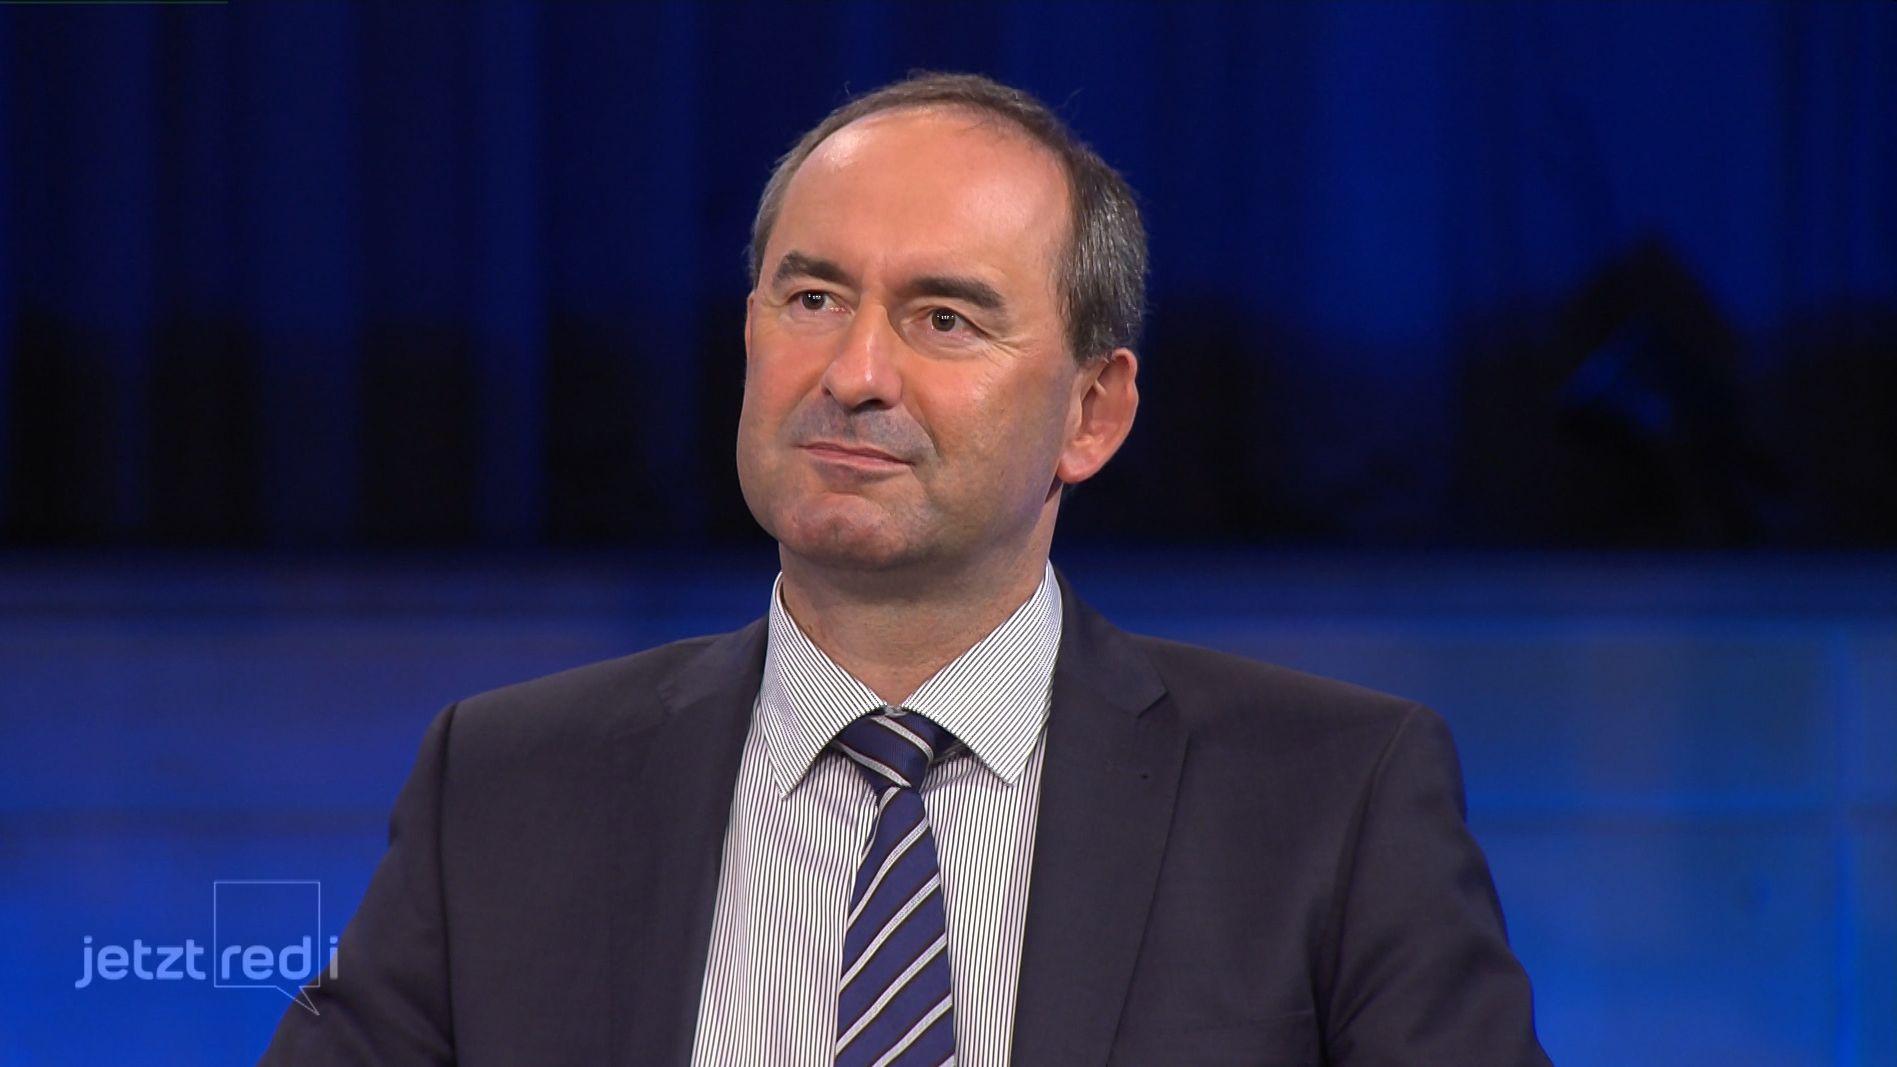 Hubert Aiwanger äußert sich zu den geplanten Stromtrassen.